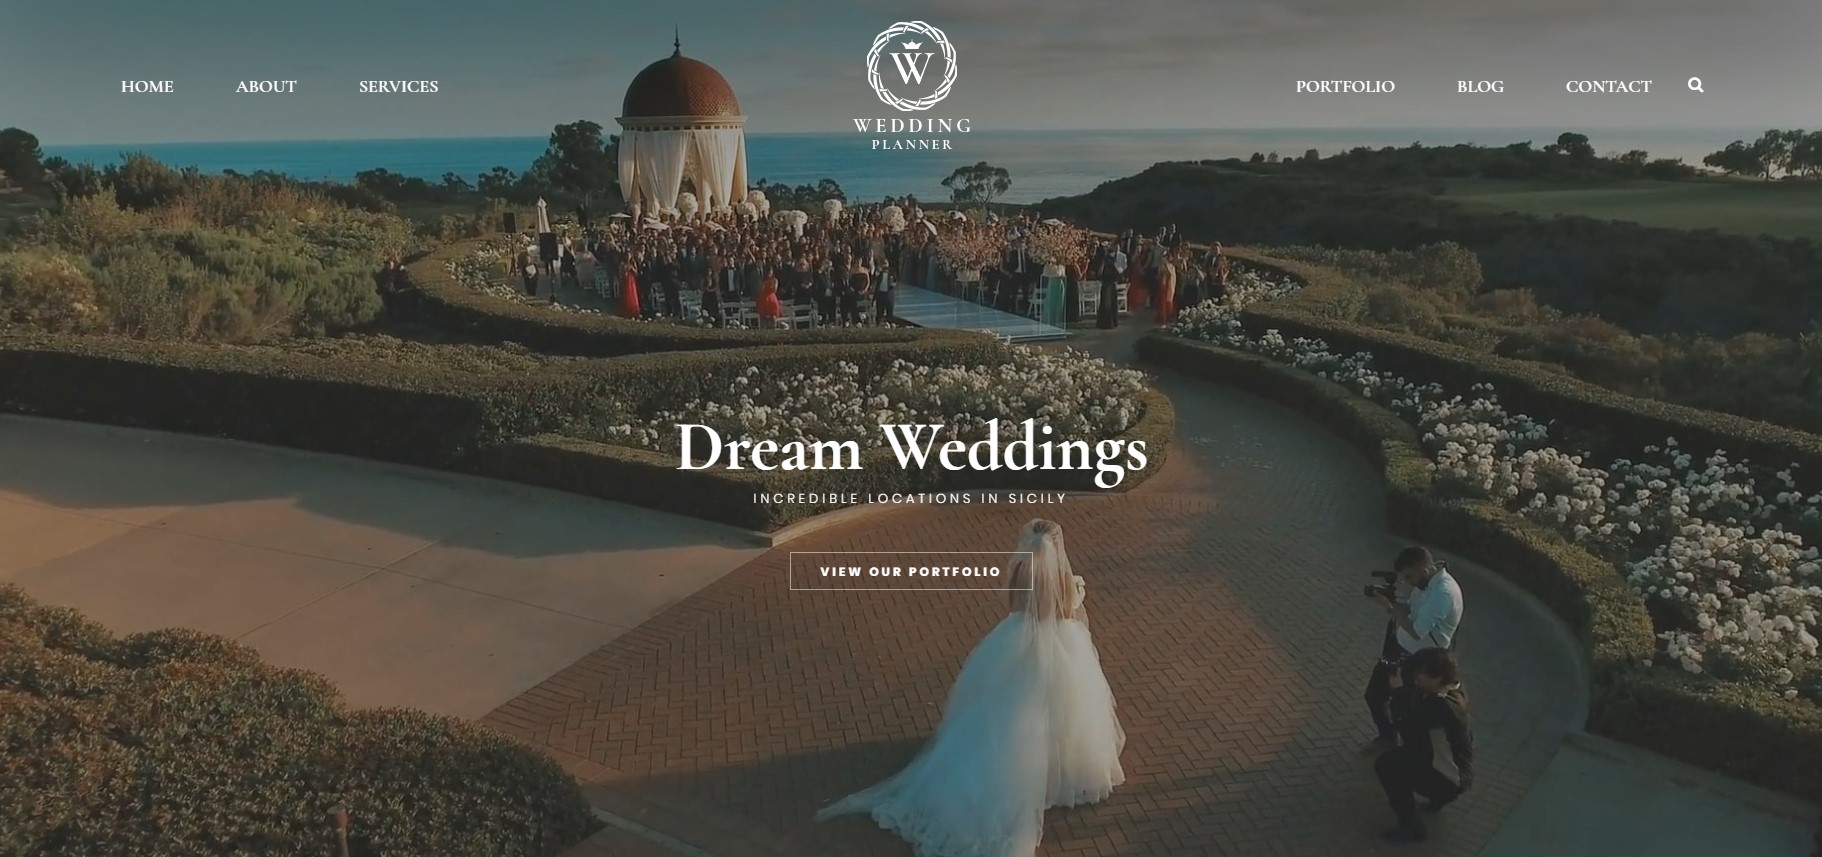 Wedding Planner Theme